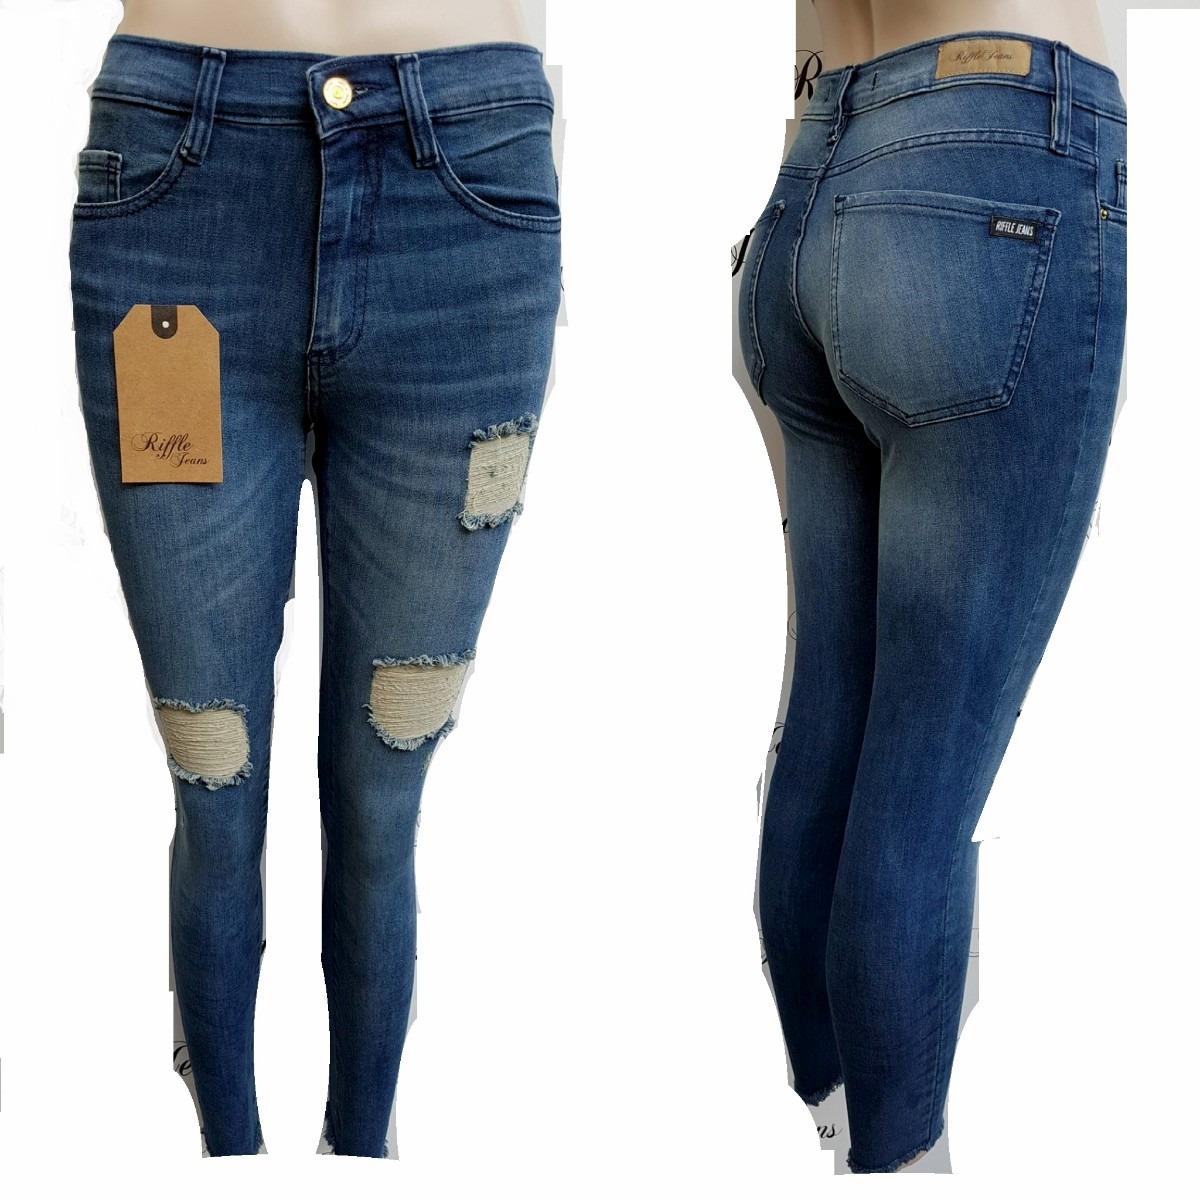 Jeans Riffle Nuevo Modelo 2017 - $ 949,99 en Mercado Libre